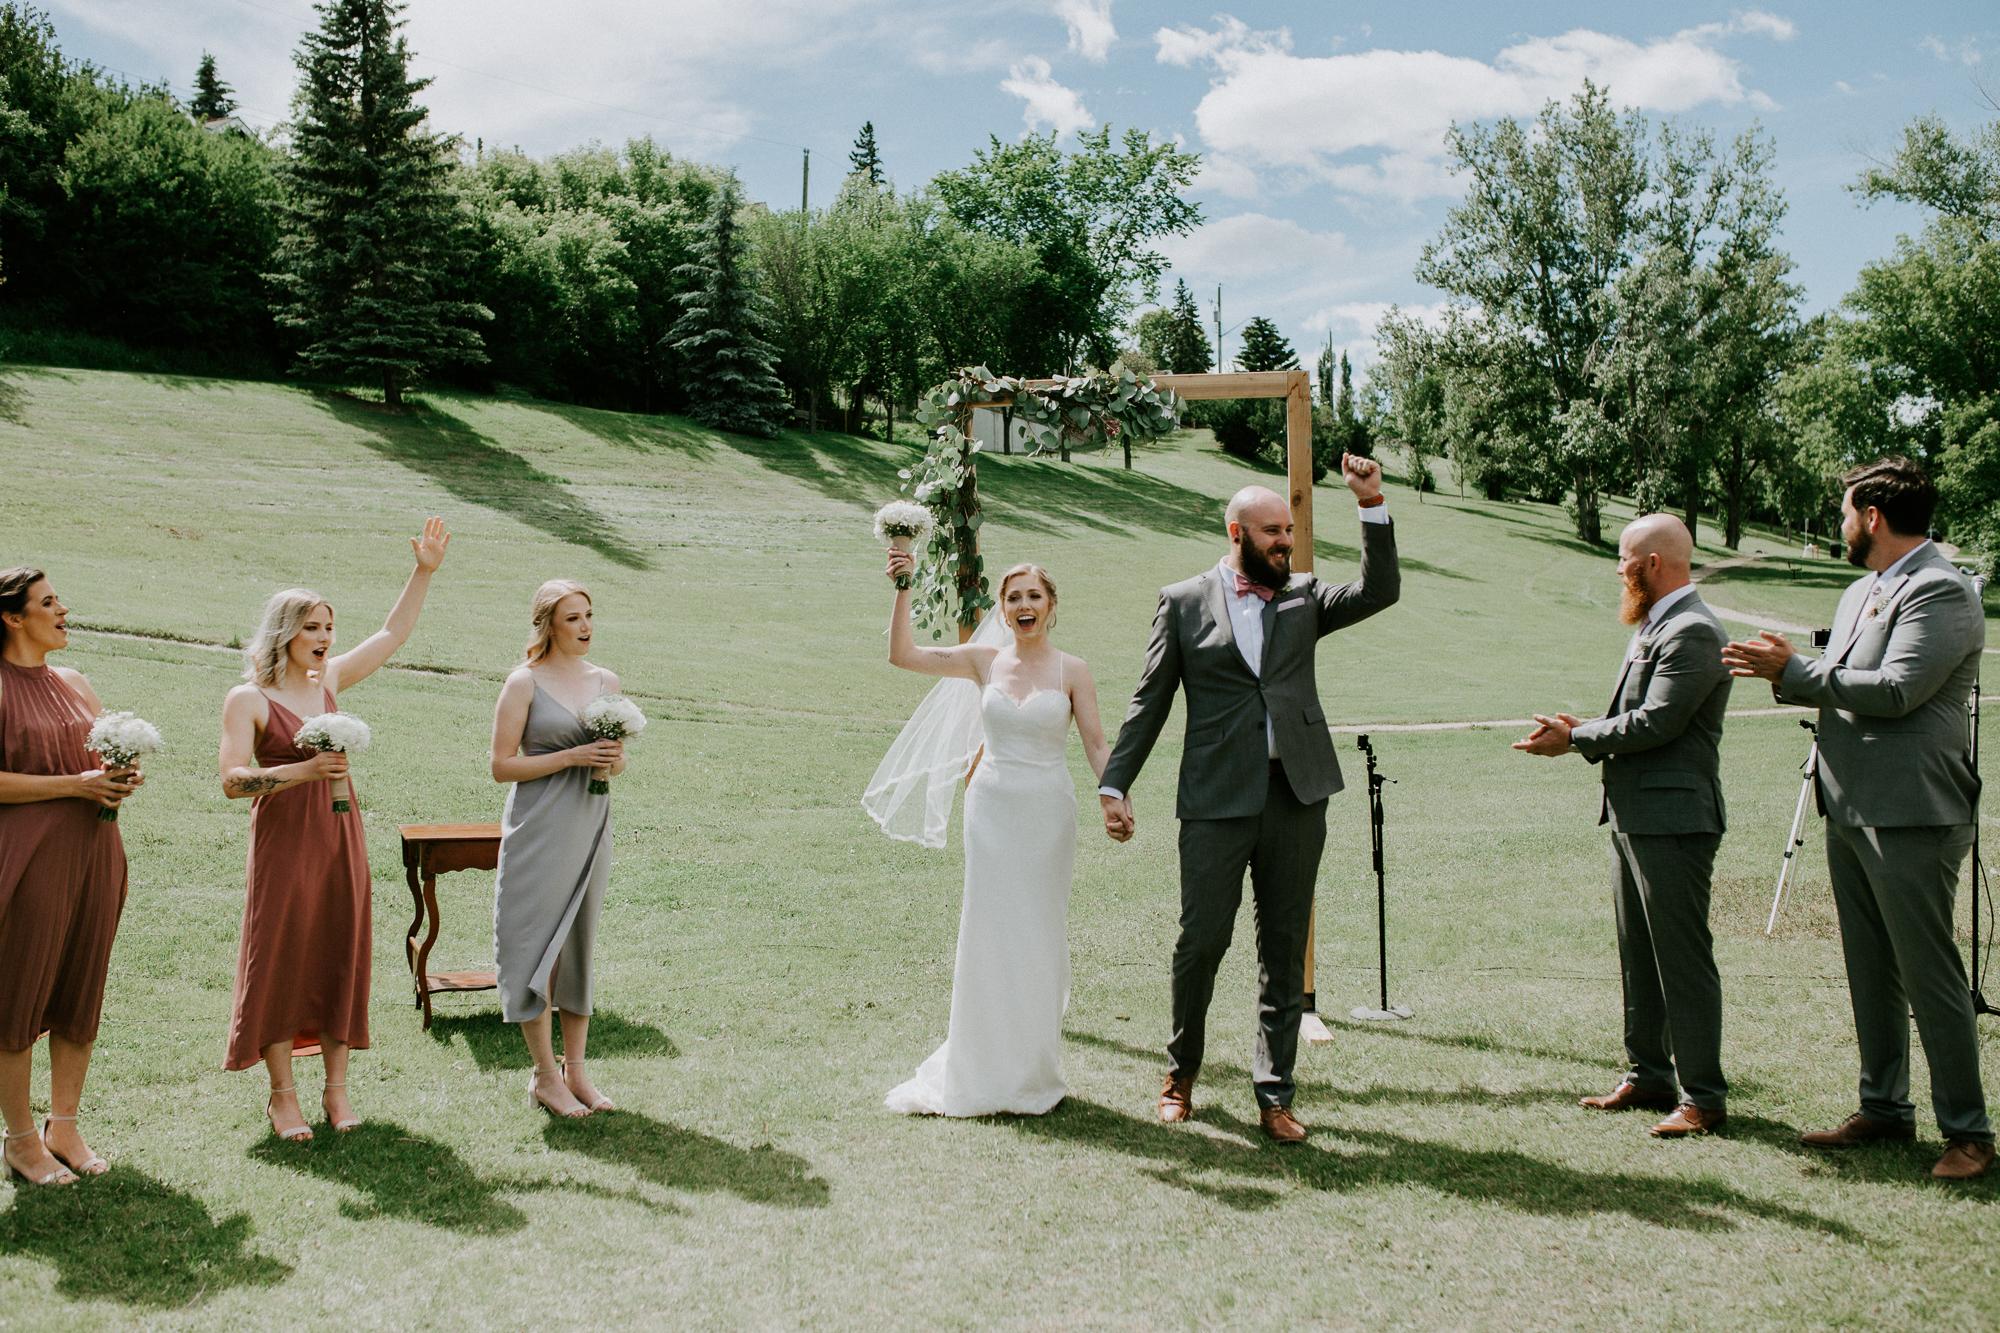 Calgary-wedding-photographer-am-53.jpg